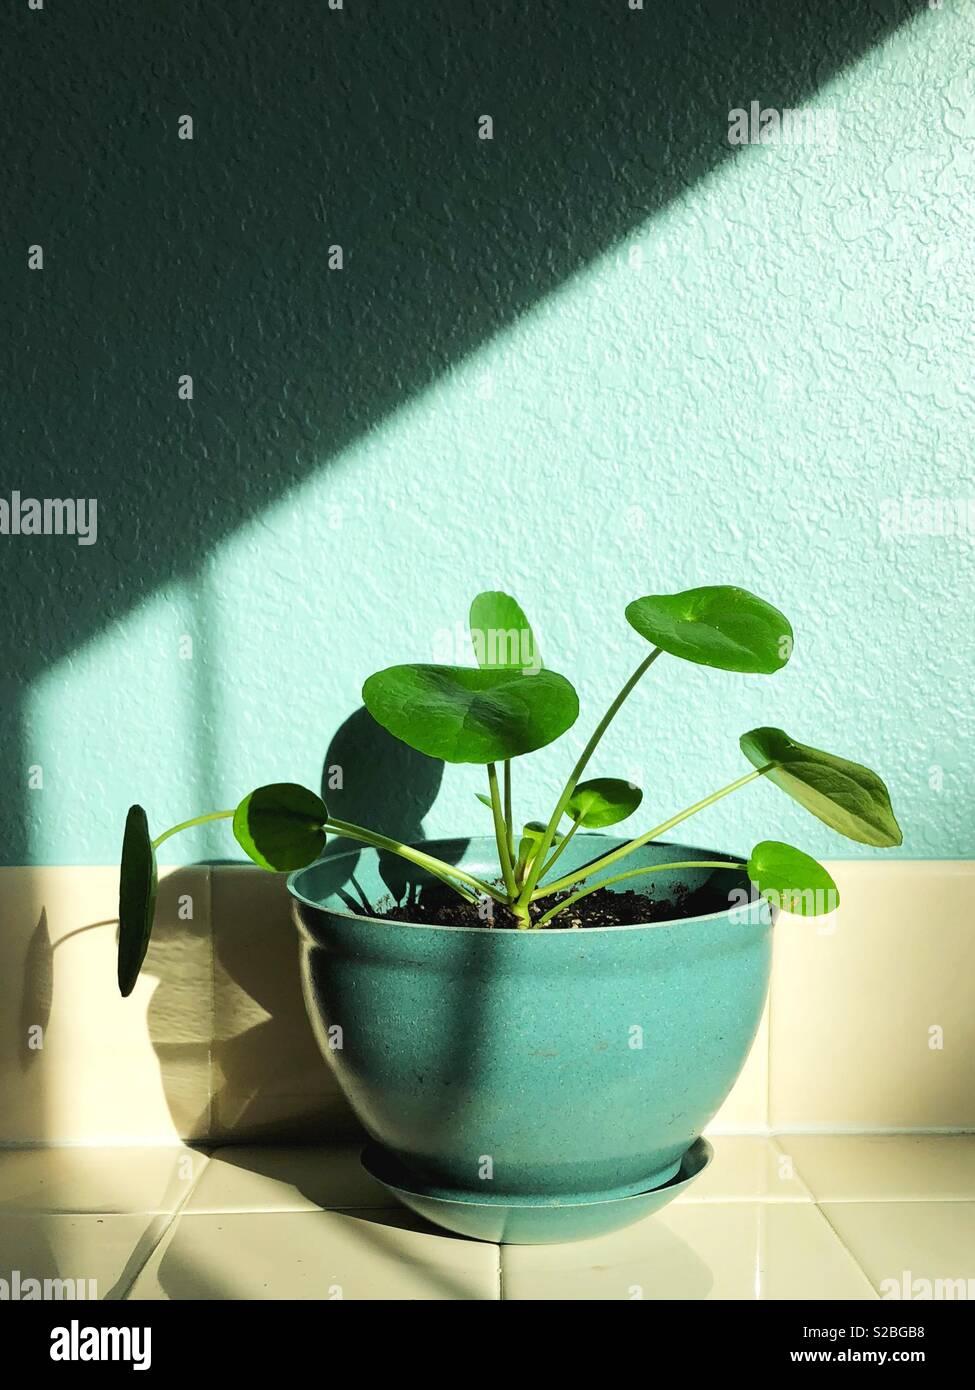 Pilea Peperomioides planta. Imagen De Stock